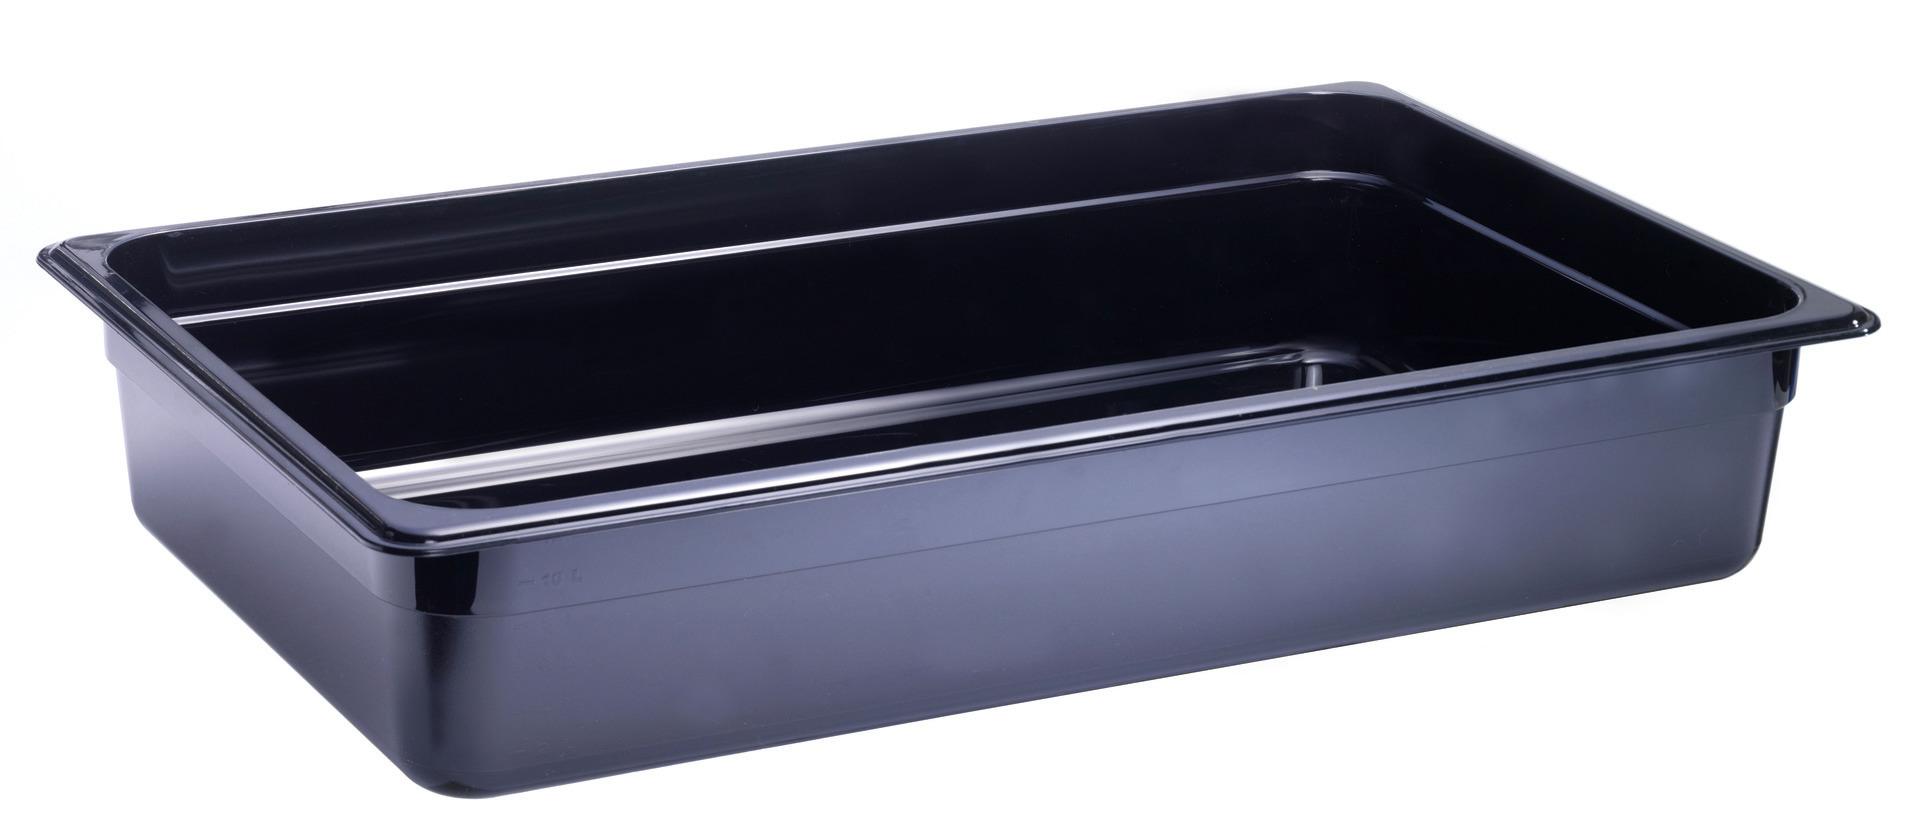 GN-Behälter GN 1/1 530 x 325 x 100 mm Polycarbonat schwarz